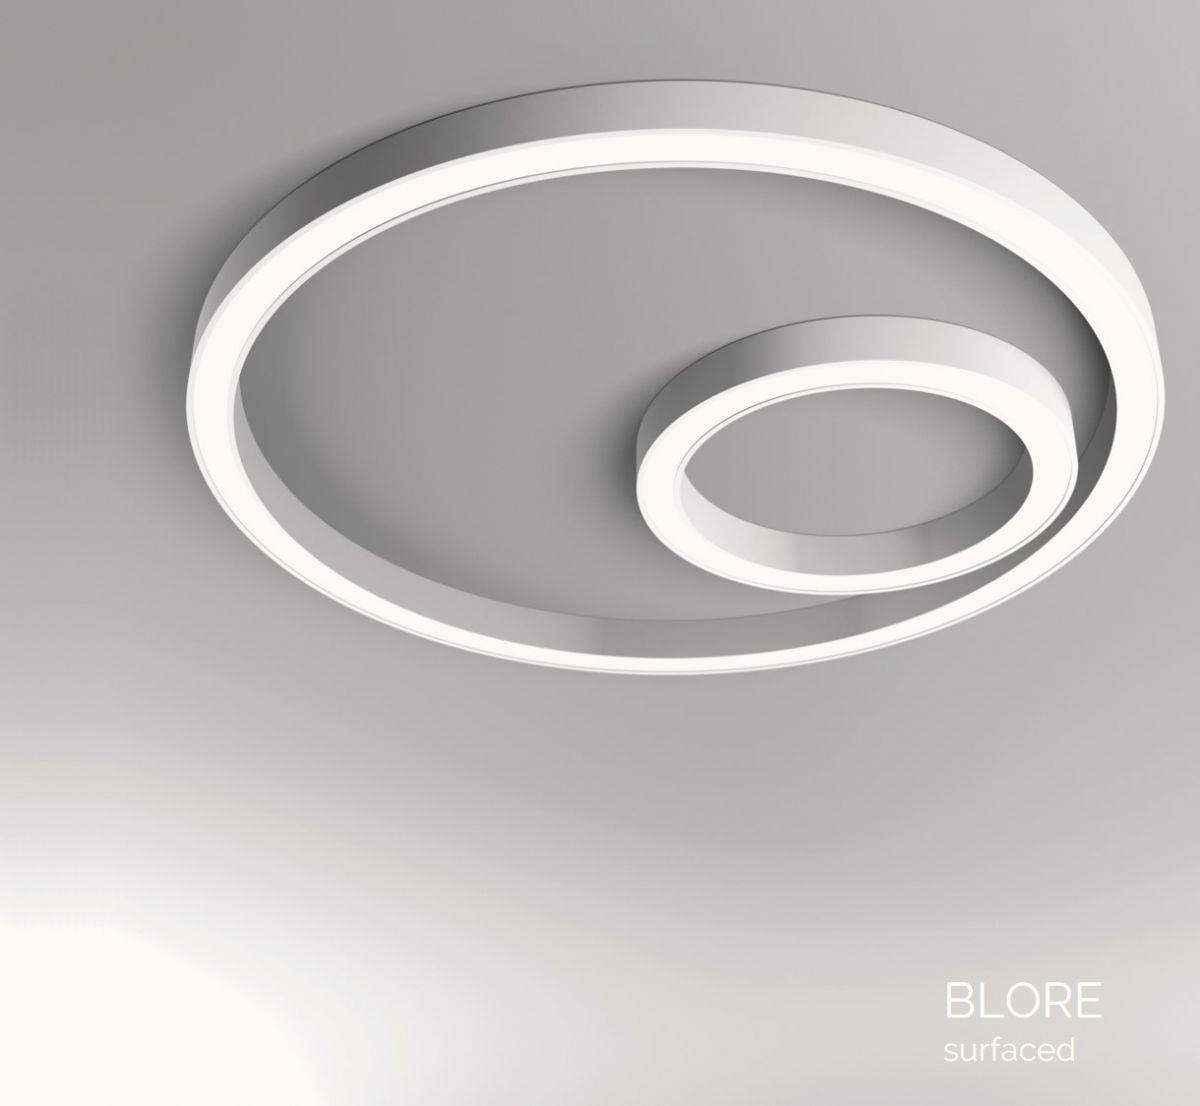 blore 111 surfaced luminaire round 700mm 4000k 2878lm 35w fix